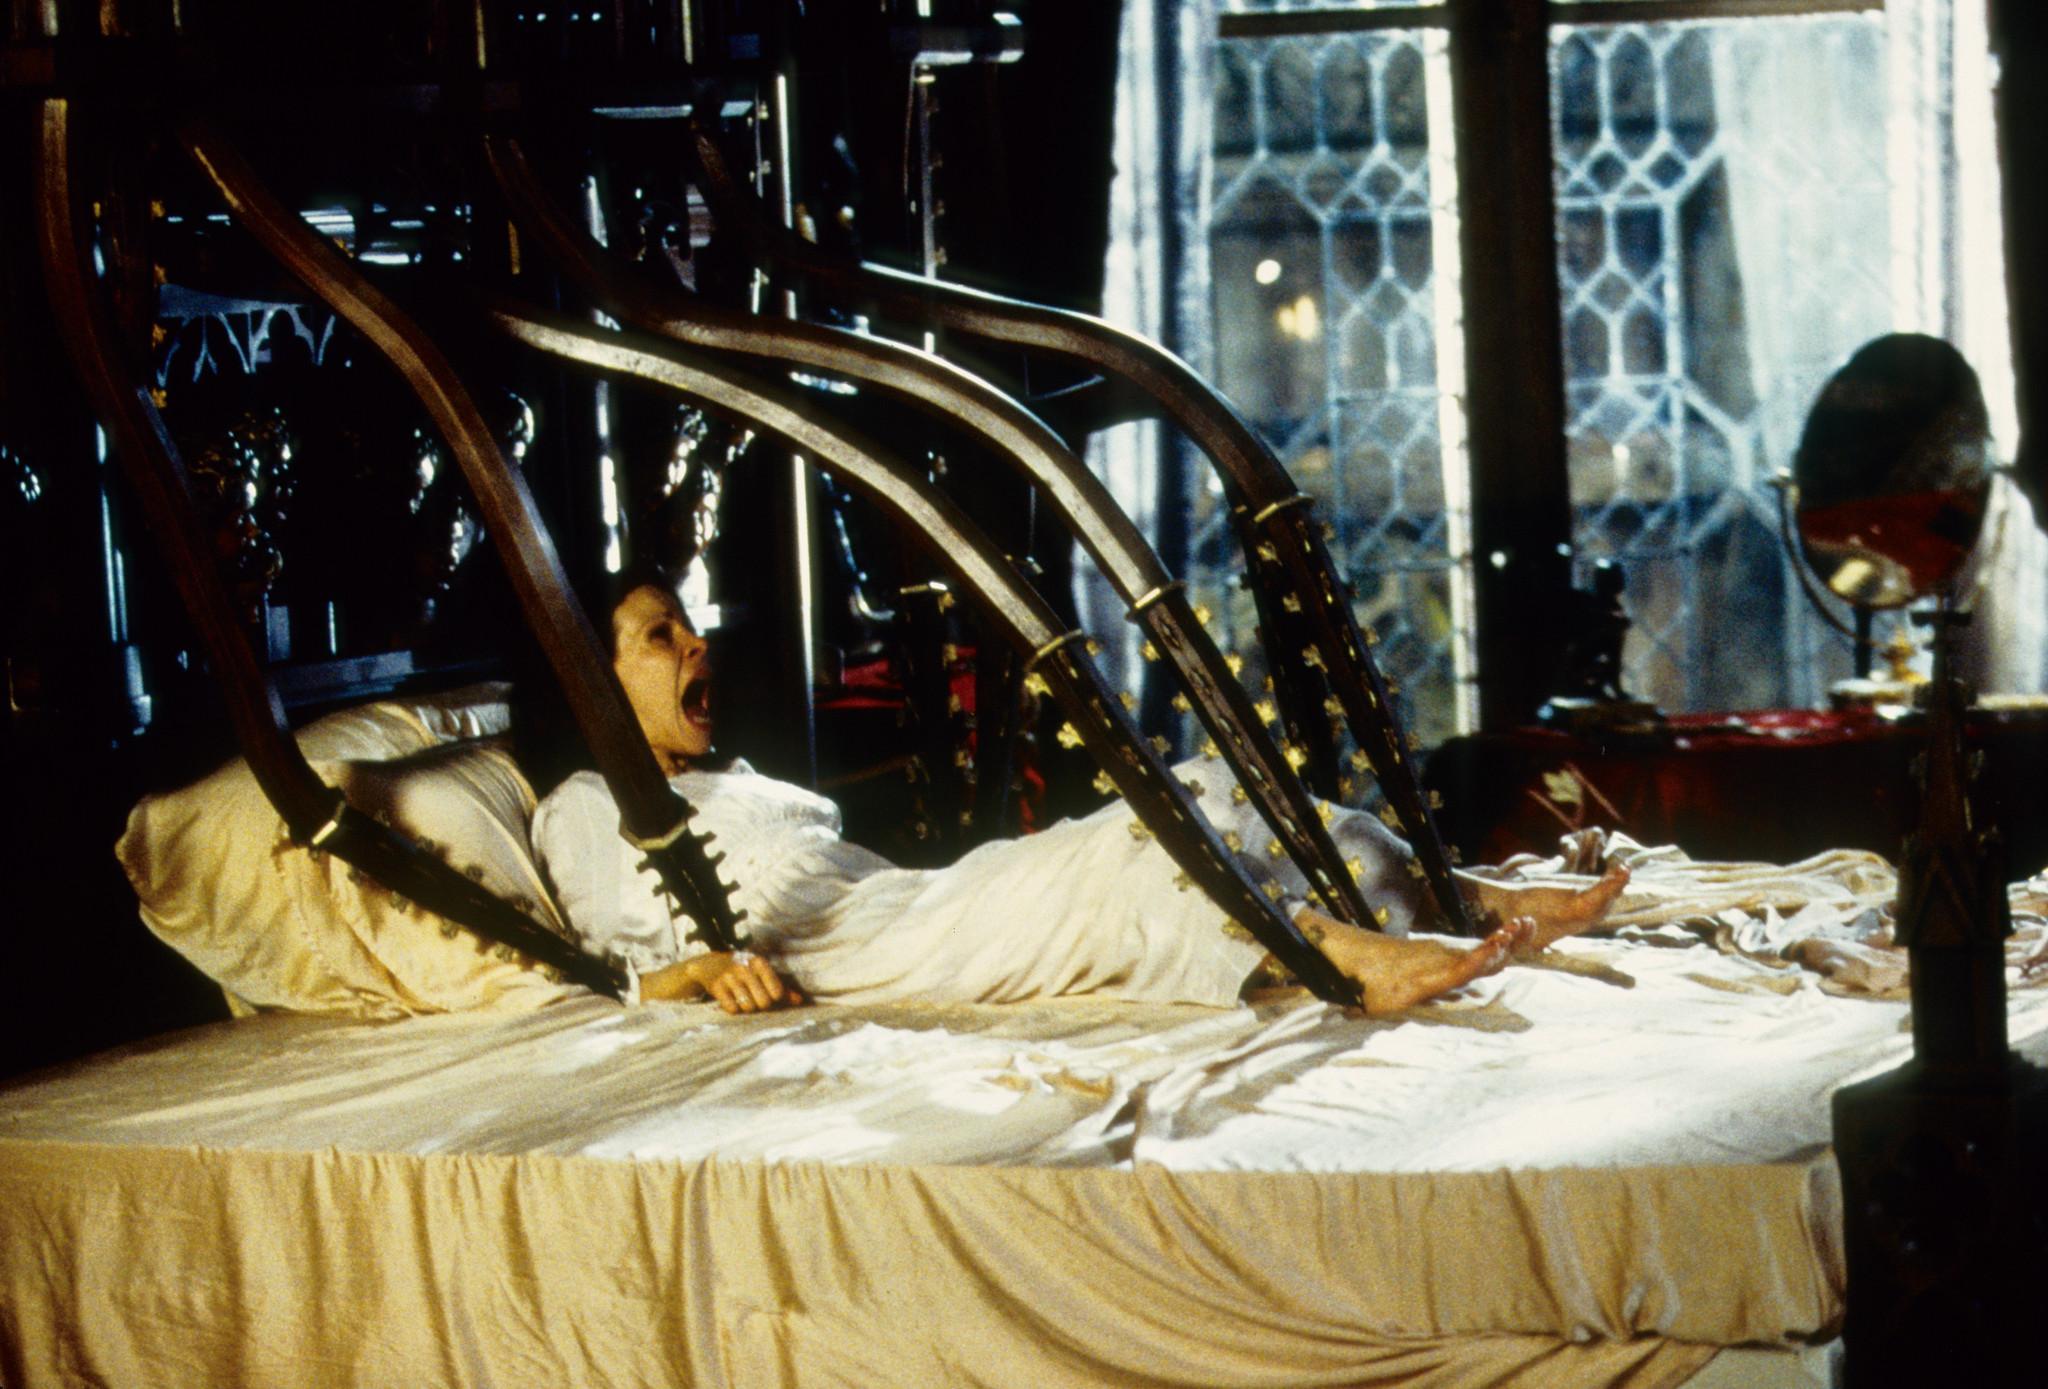 Film Review The Haunting 1999 Horrorathon 3 Film Freak Reviews